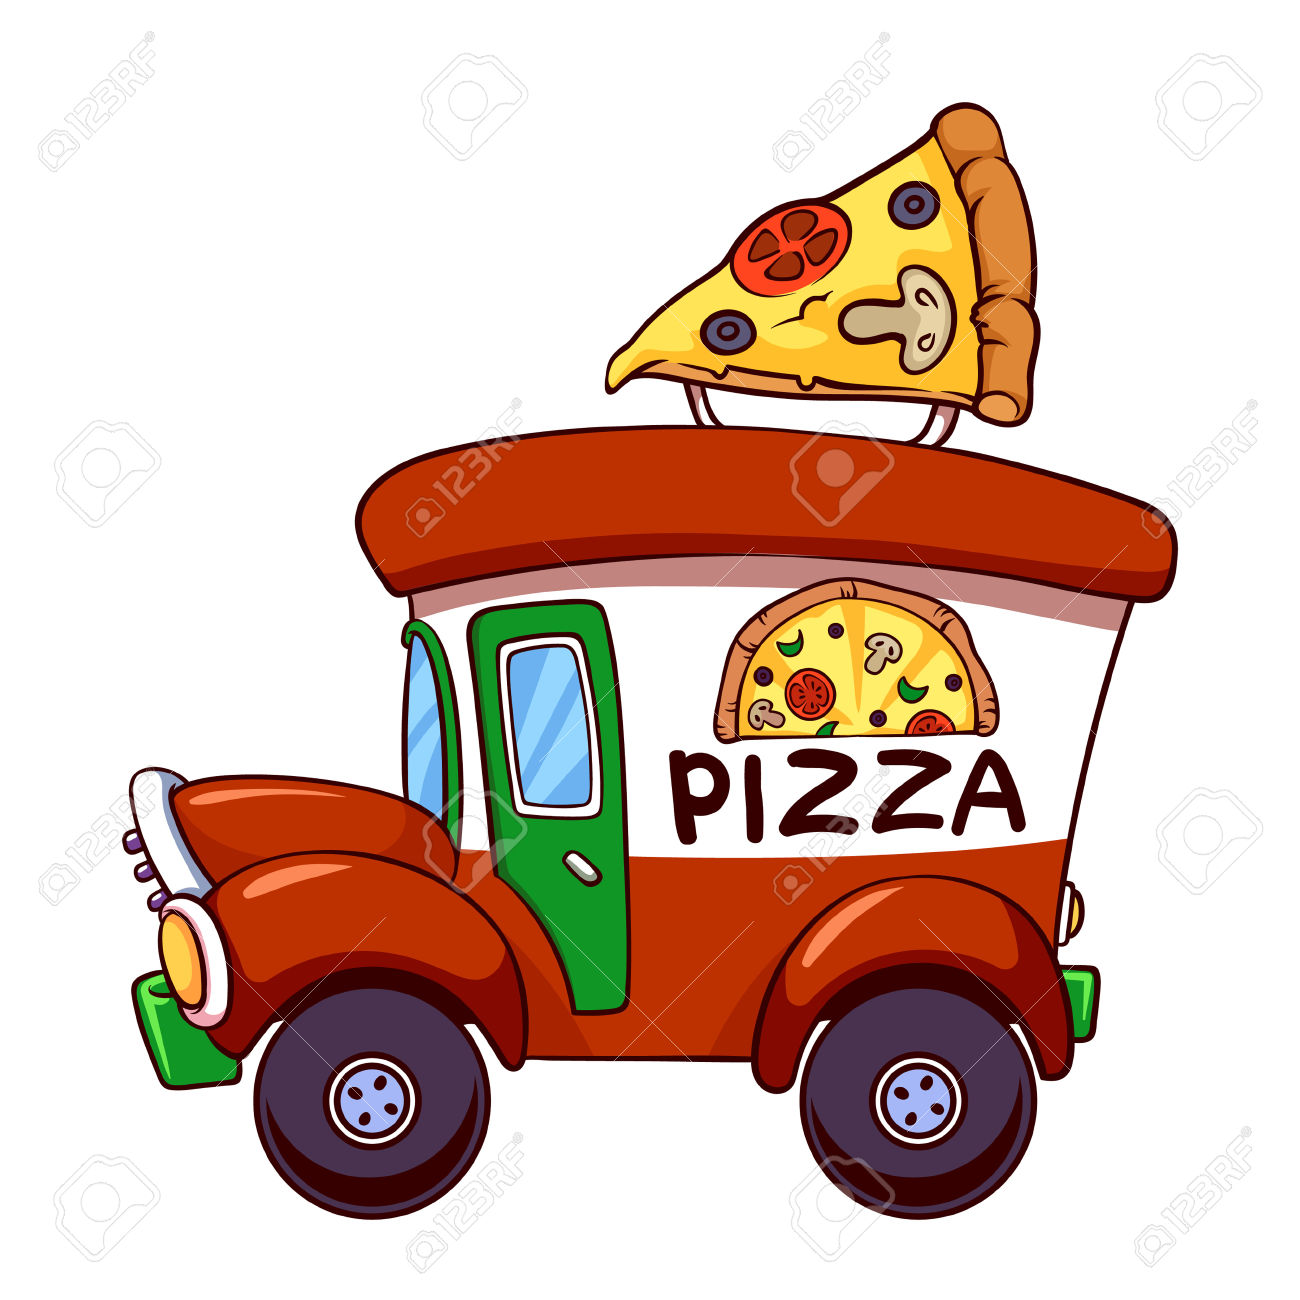 Pizza car clipart.